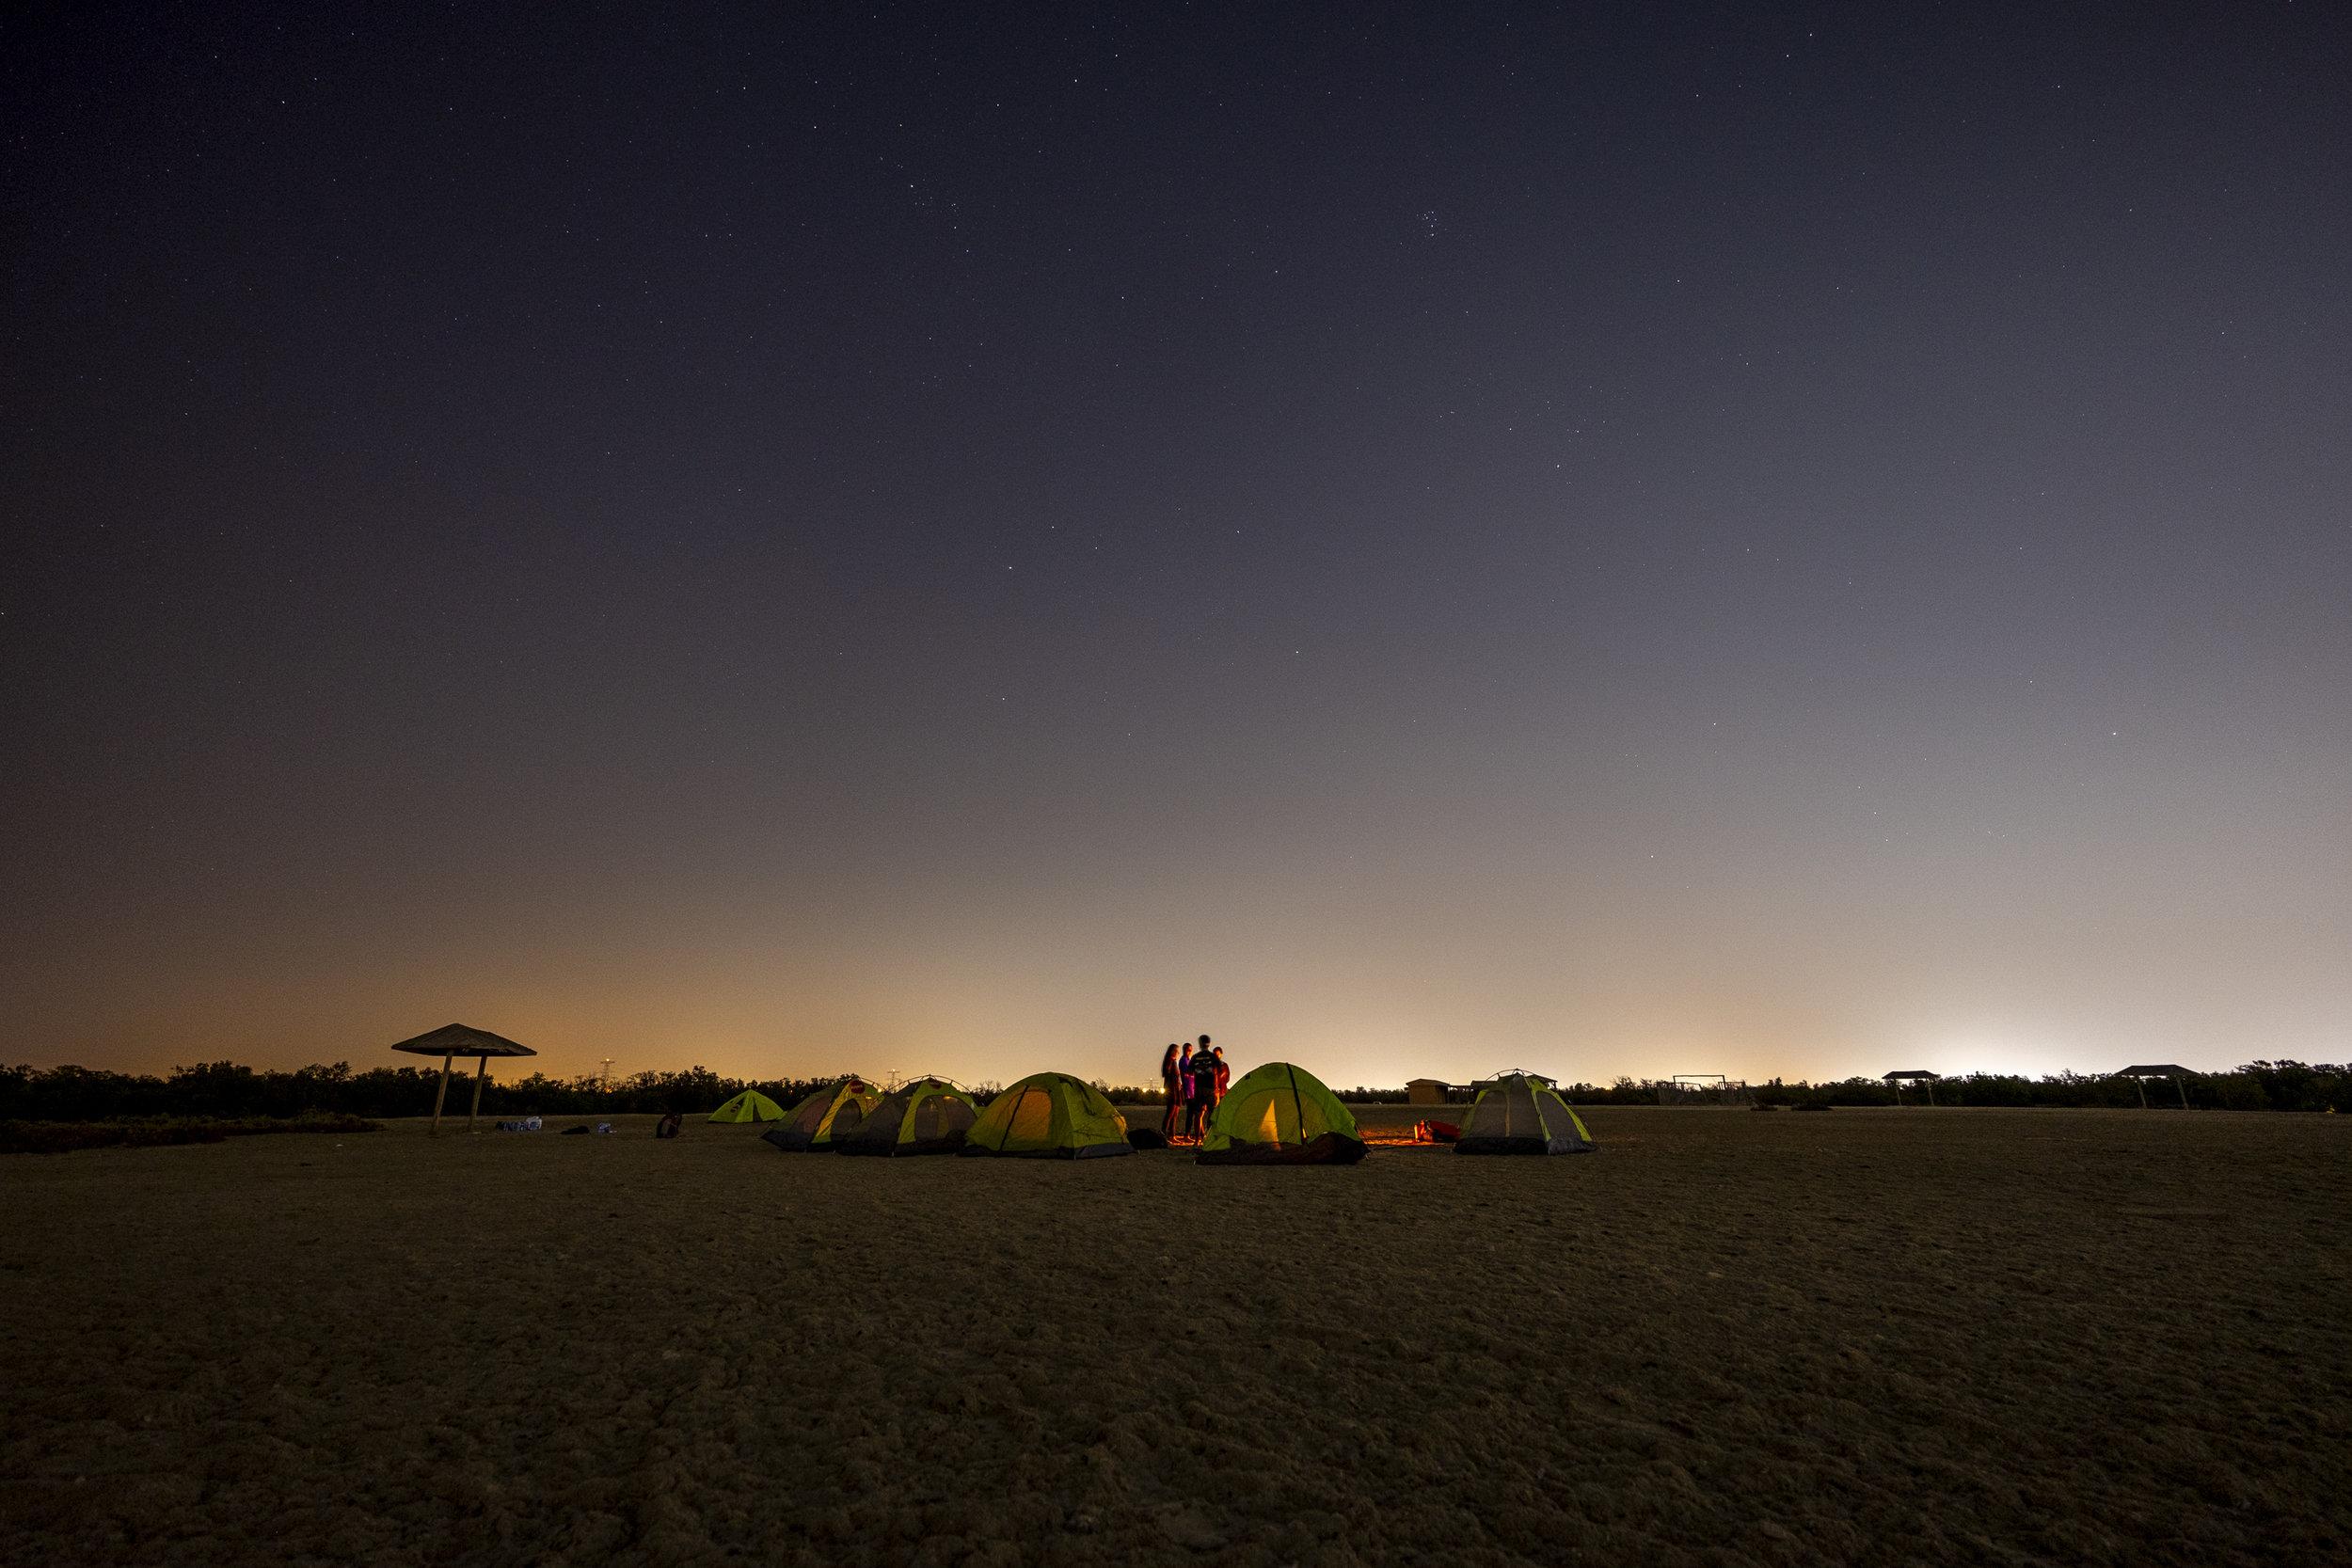 Setting up camp on mangrove island_Abu Dhabi_(c)Oliver Wheeldon.jpg